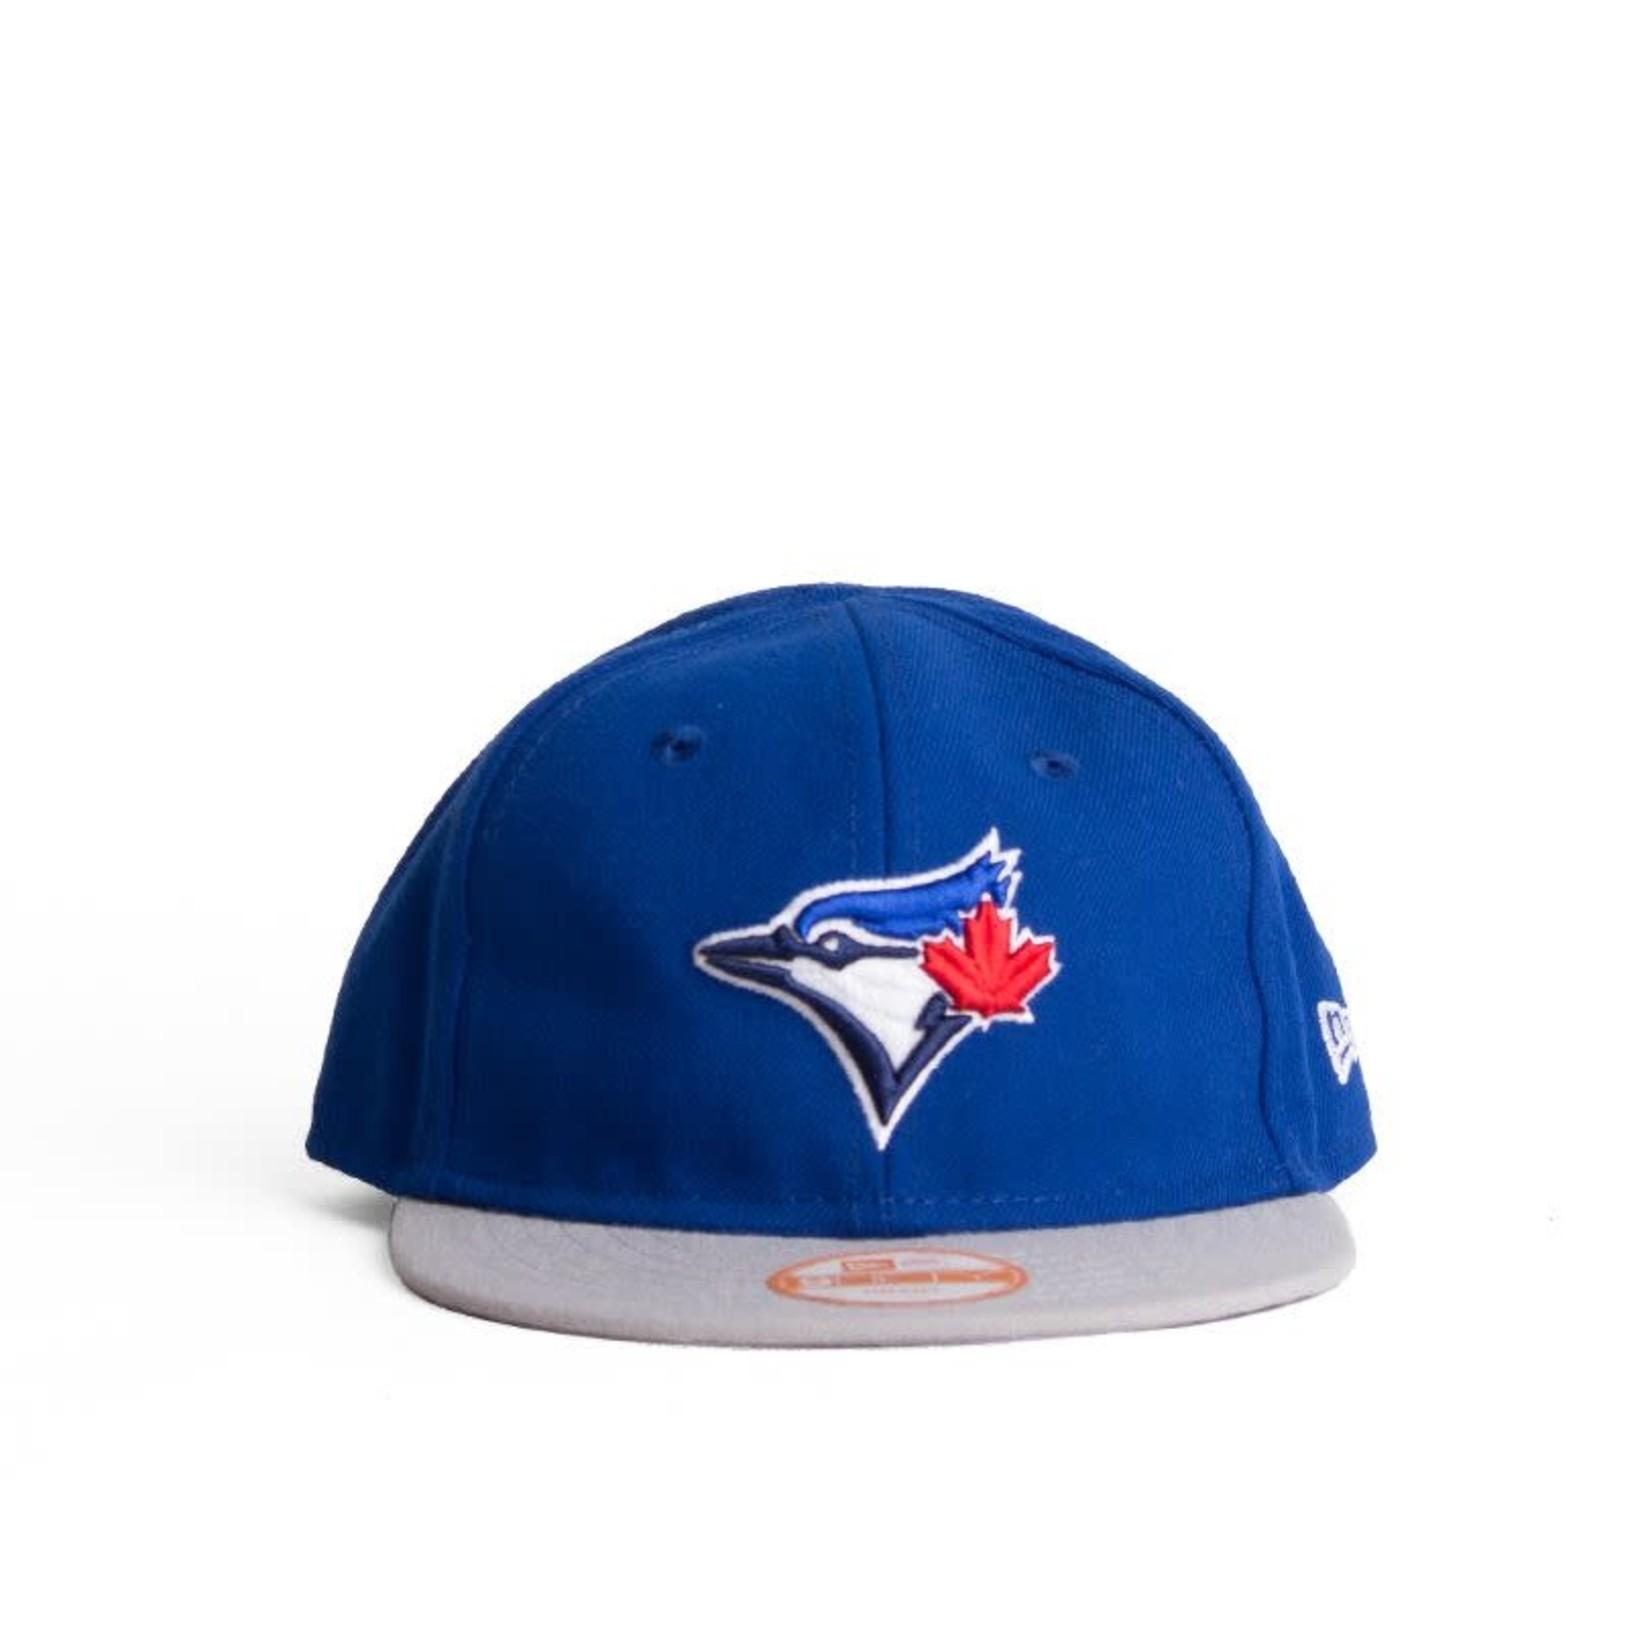 New Era New Era : My 1st 950 MLB Toronto Blue Jays Infant Cap Royal O/S